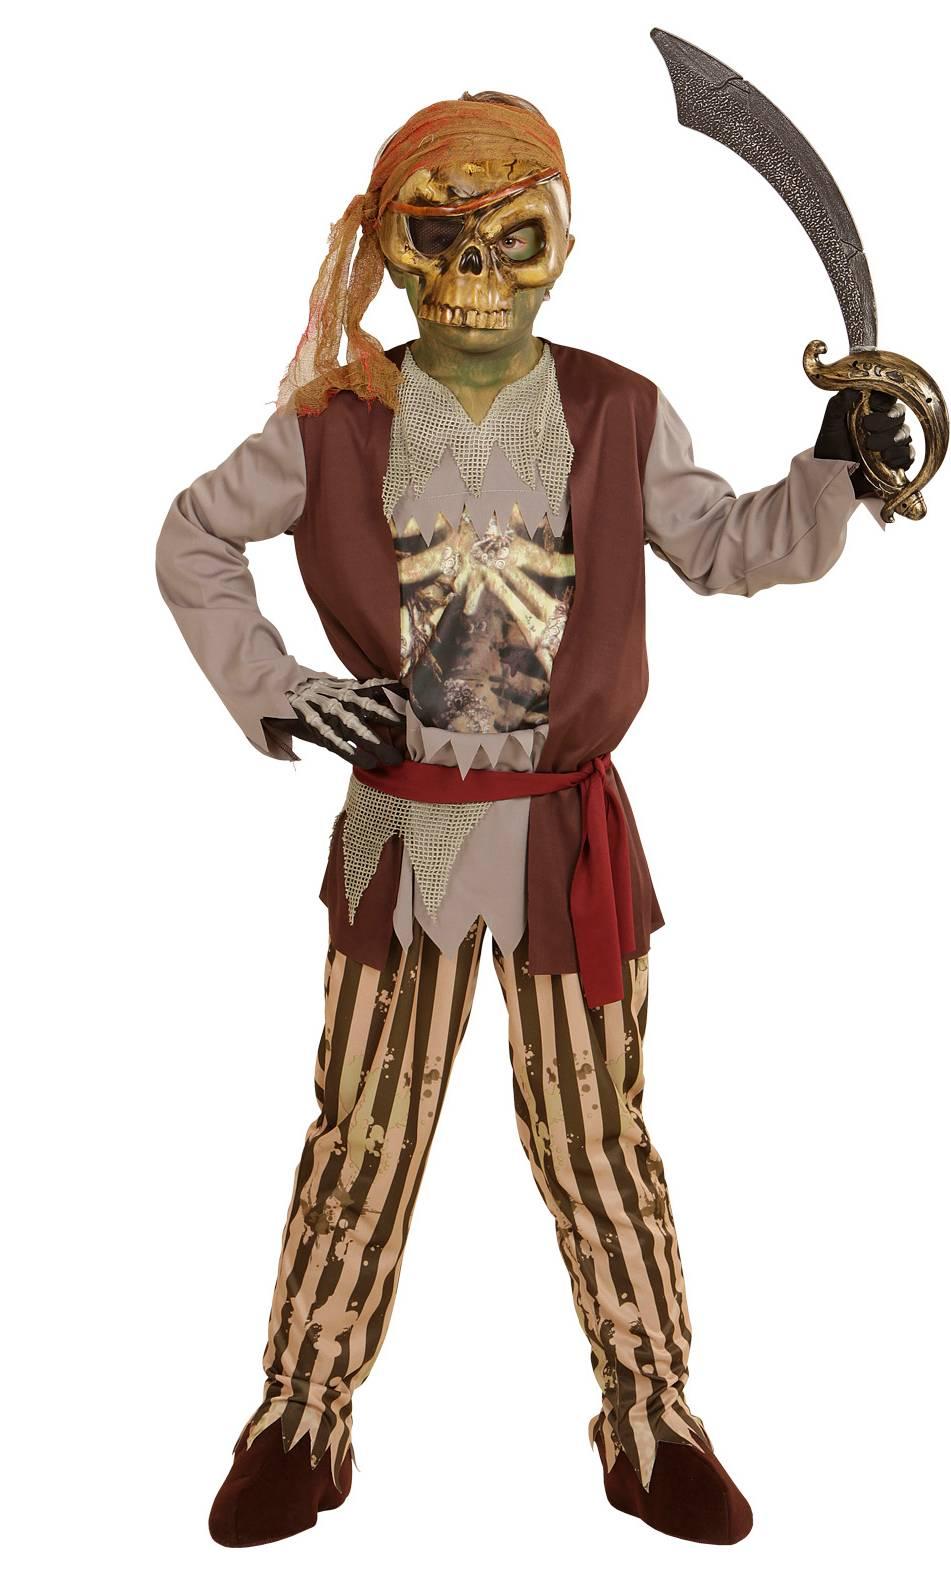 Costume-de-pirate-fantôme-12-ans-2